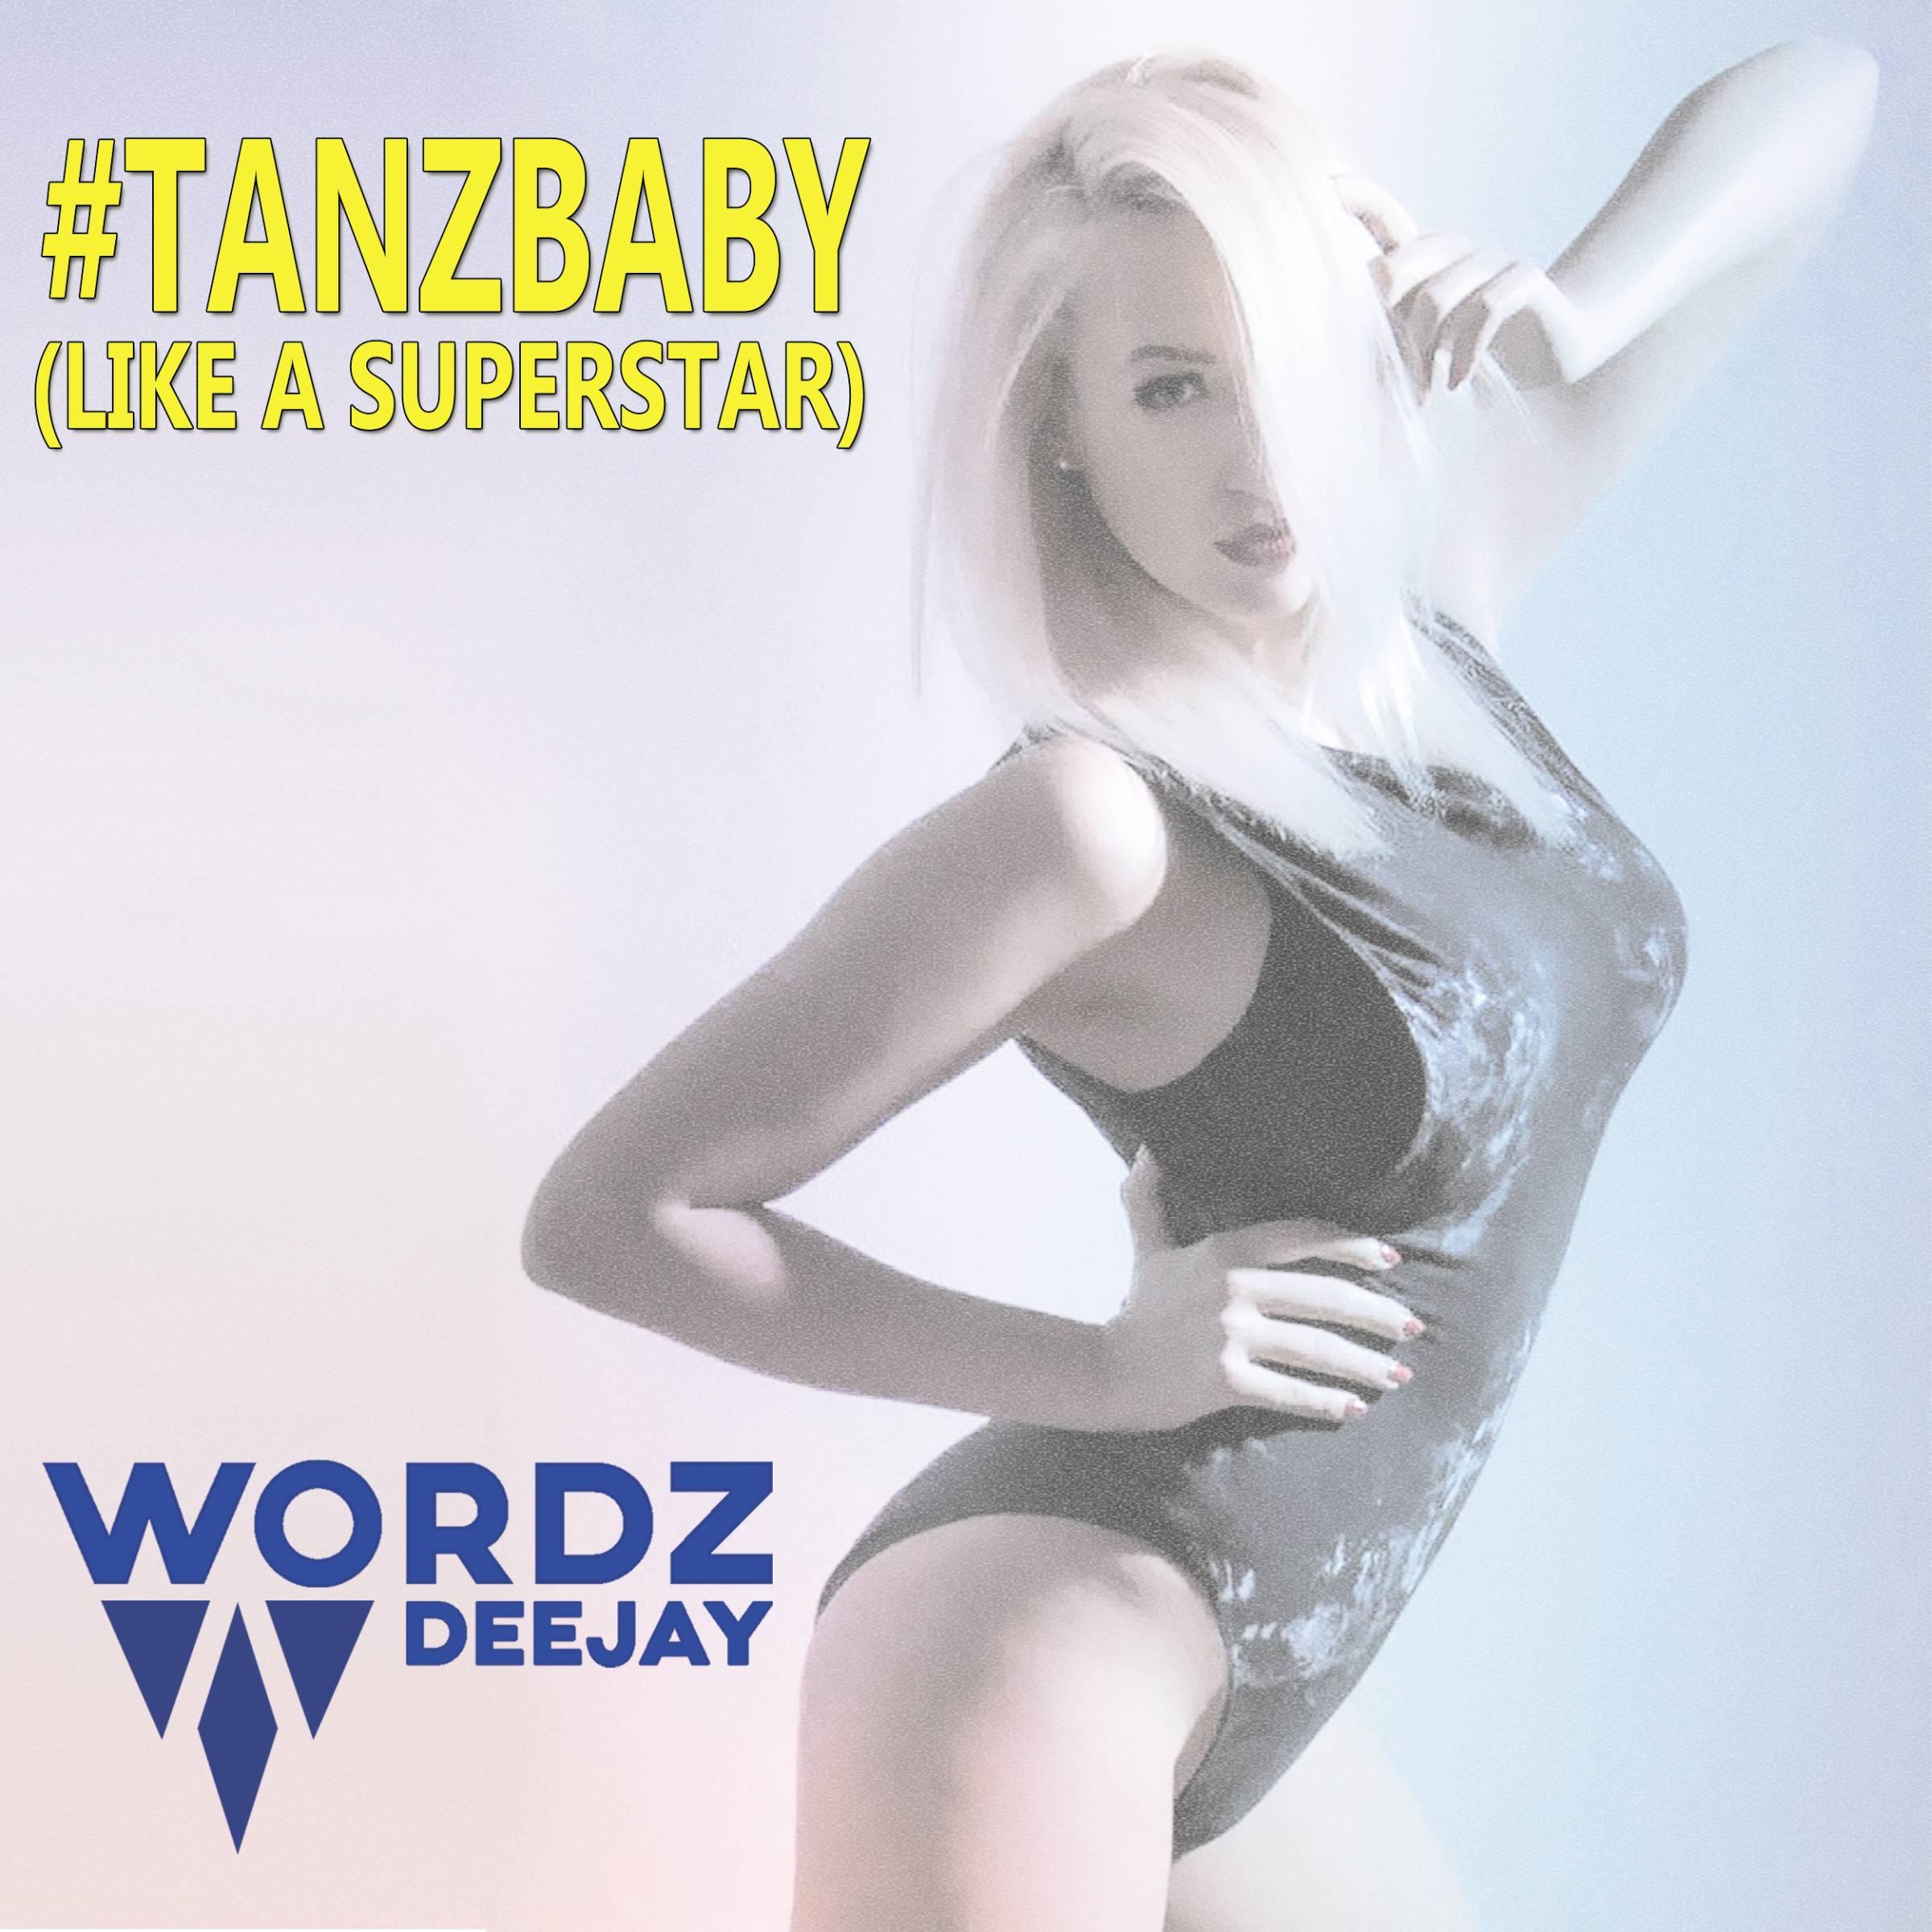 WORDZ DEEJAY-Tanz Baby (like A Superstar)